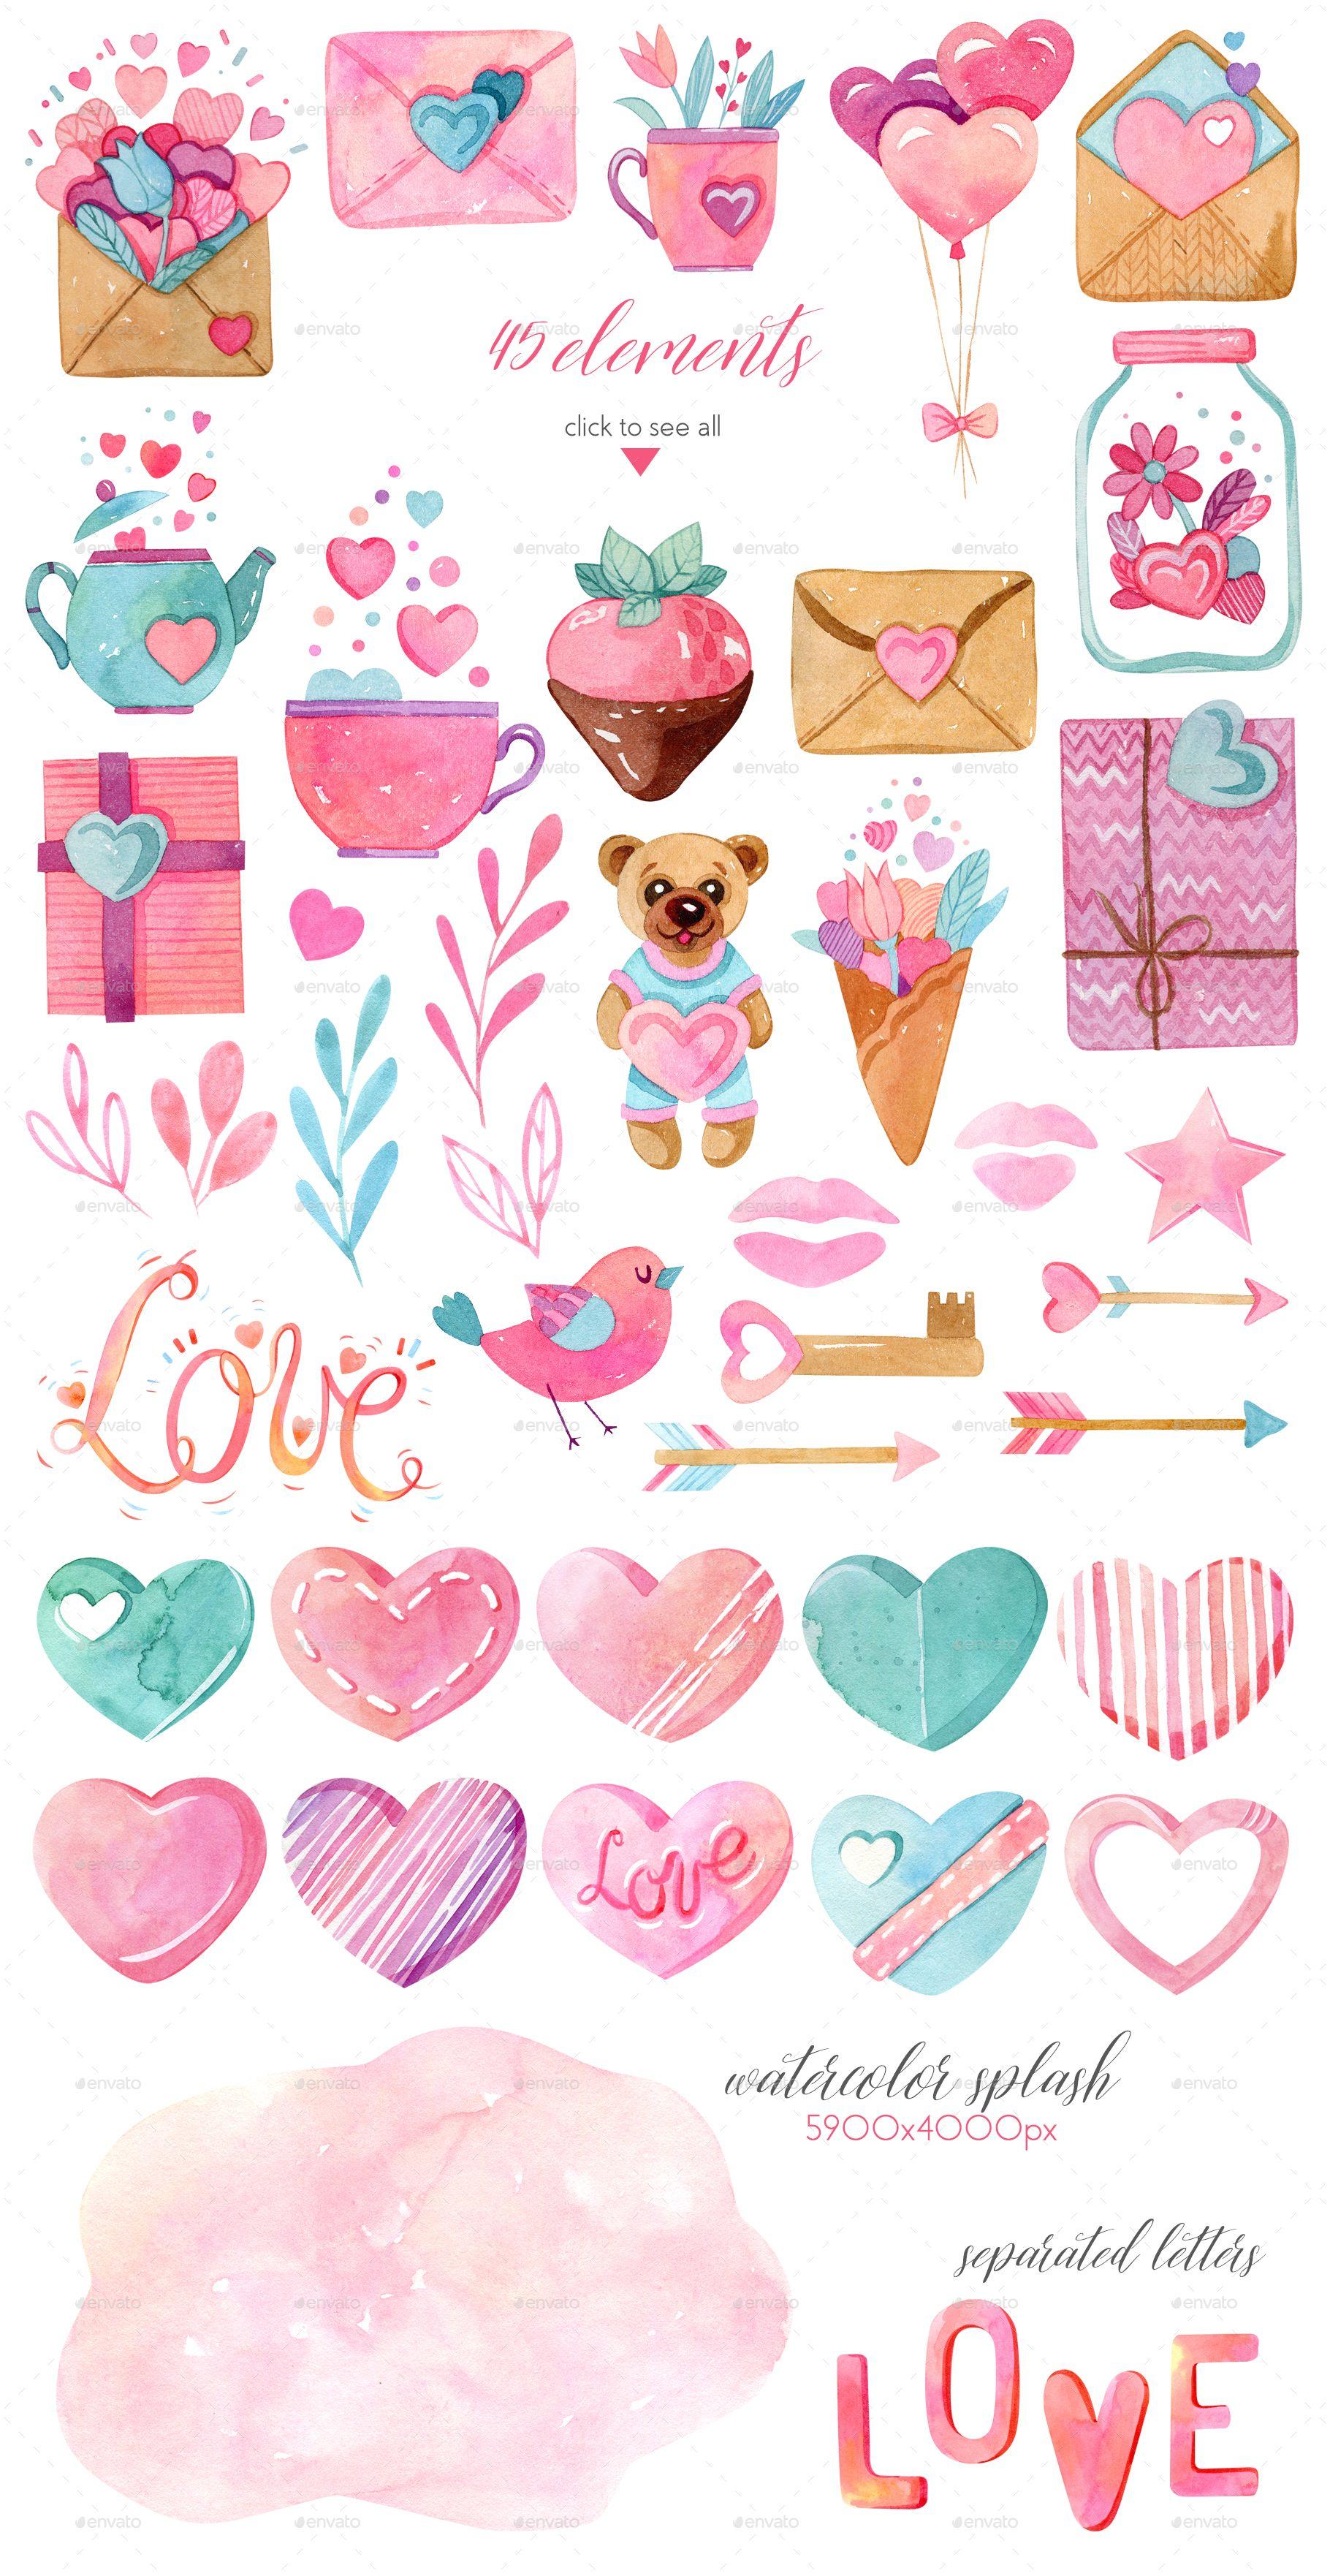 aquarell valentinstag sammlung #valentines, #watercolor, #